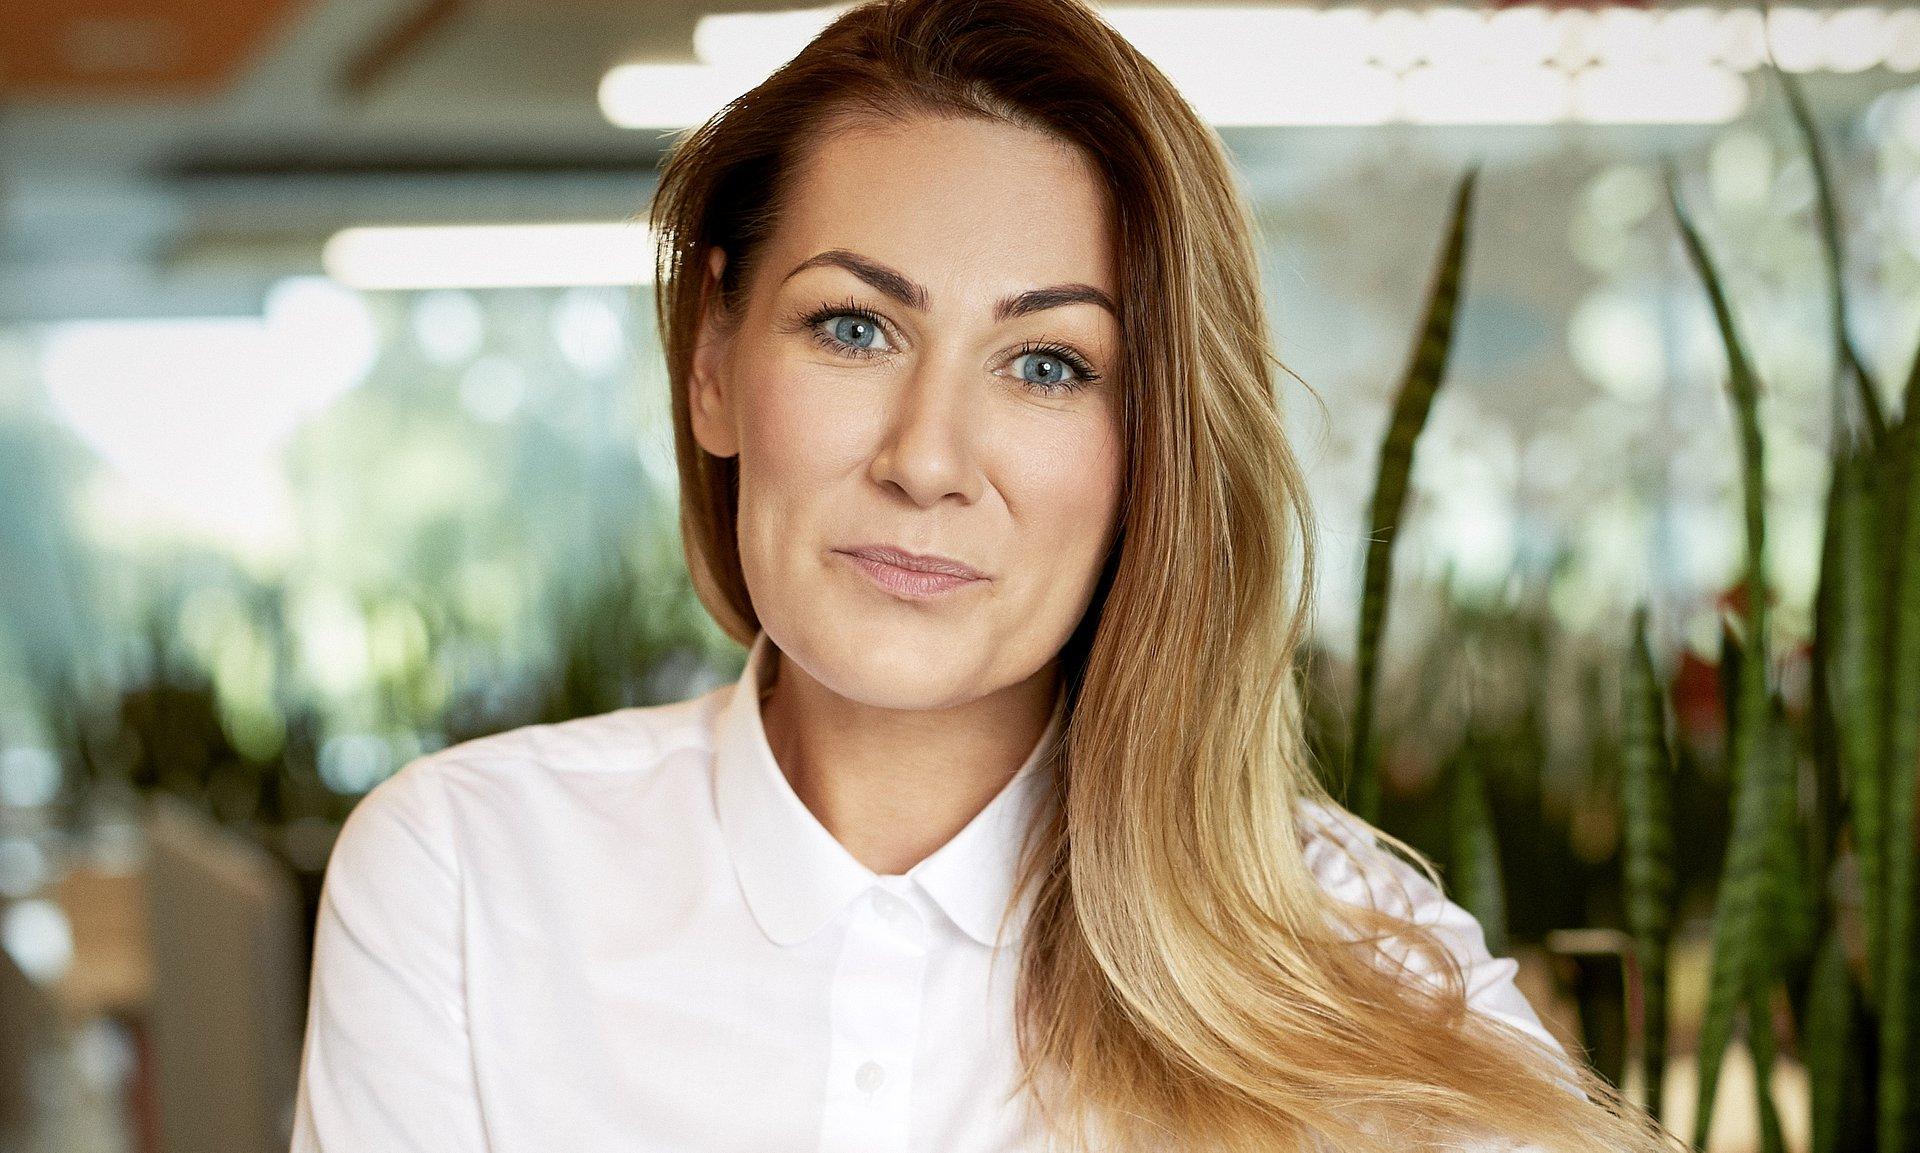 Justyna Gabryszewska-Szewczuk